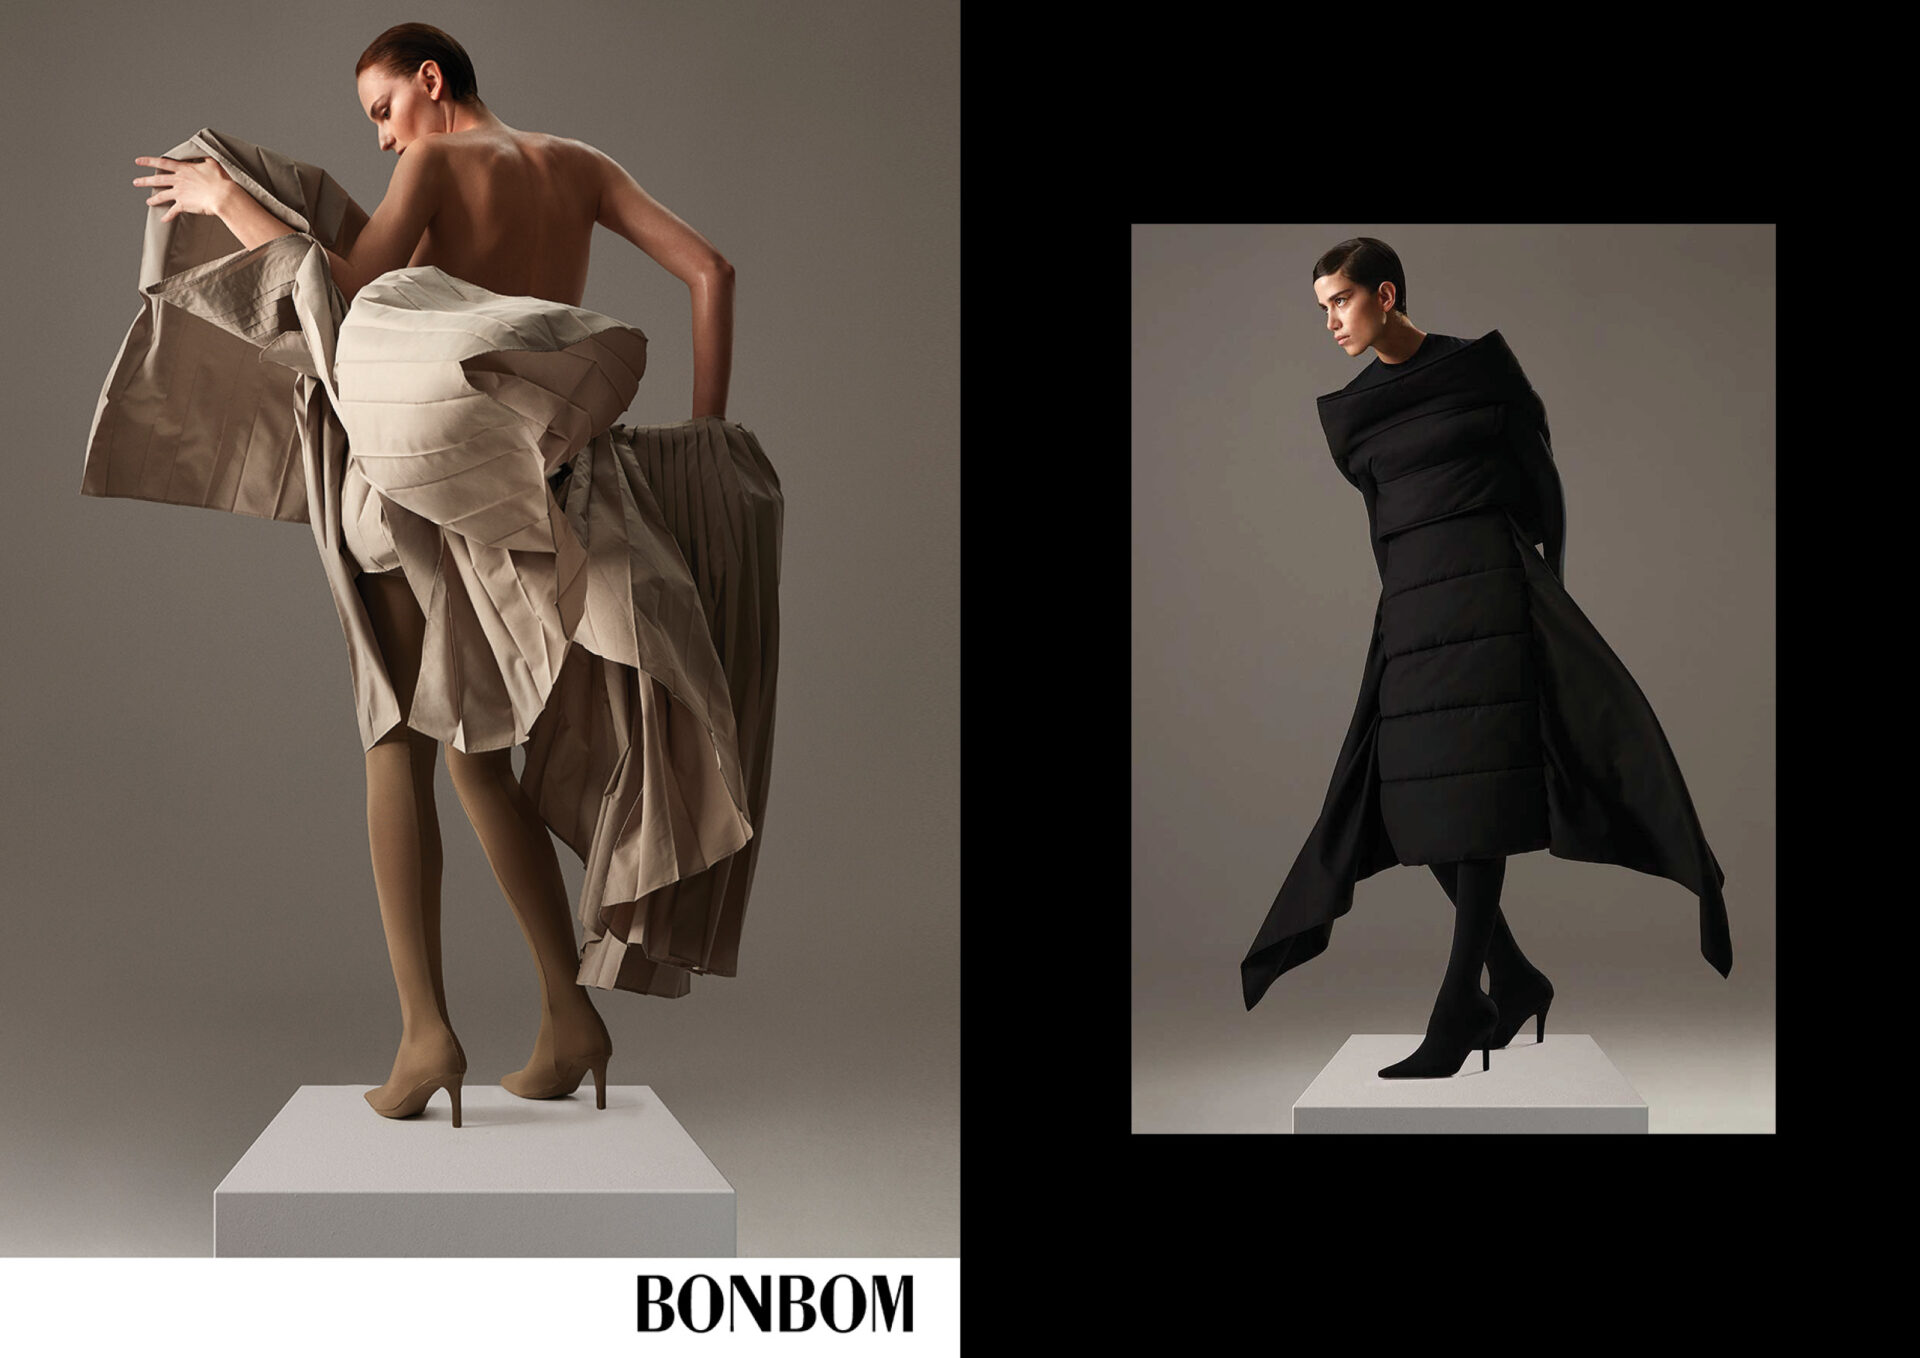 TALK:BONBOM by Beca Montenegro